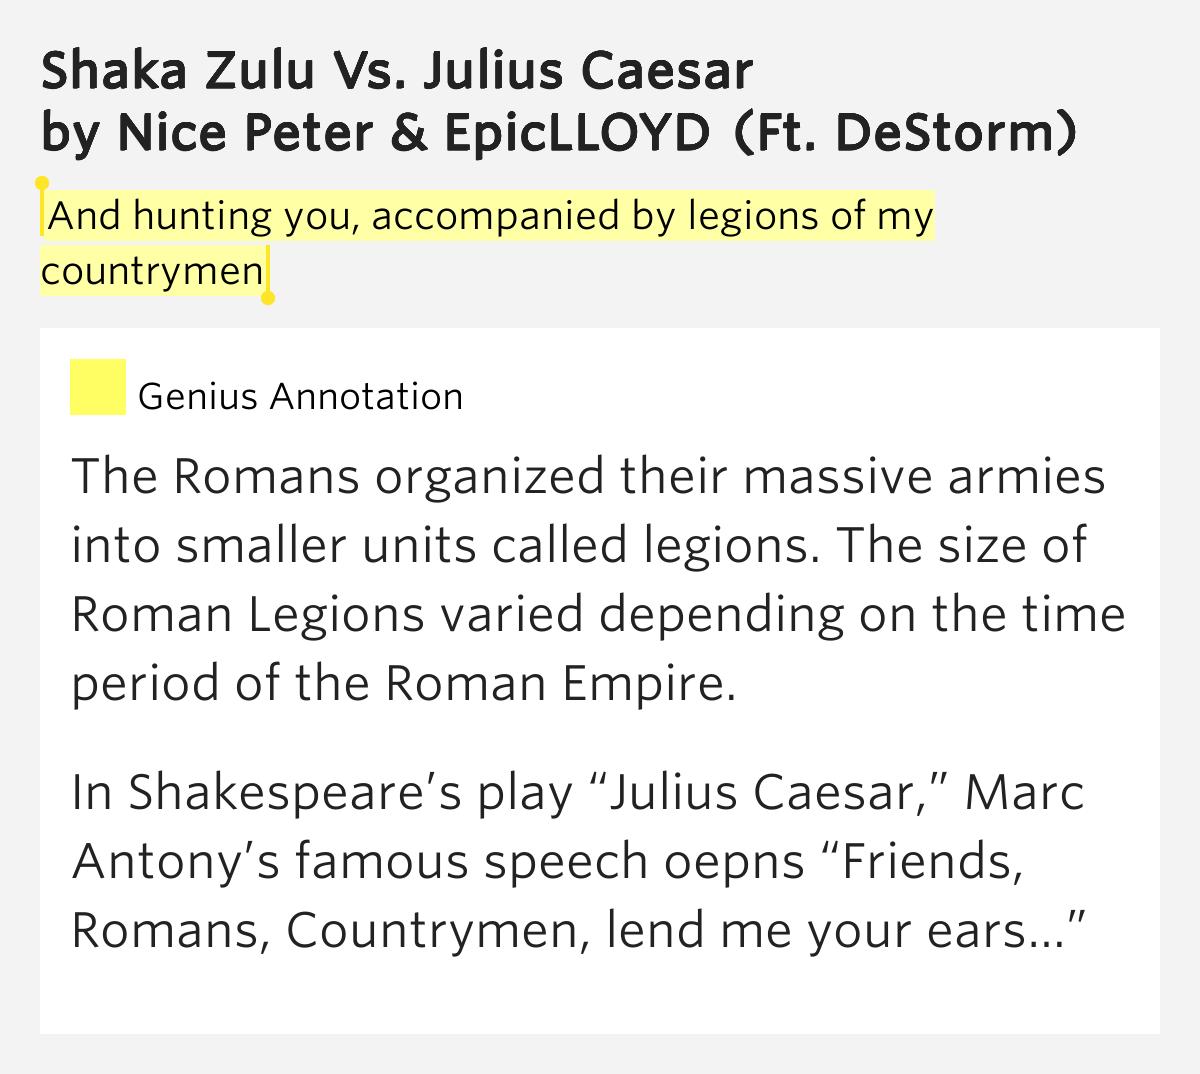 And Hunting You Accompanied By Legions Of My Countrymen Shaka Zulu Vs Julius Caesar Lyrics